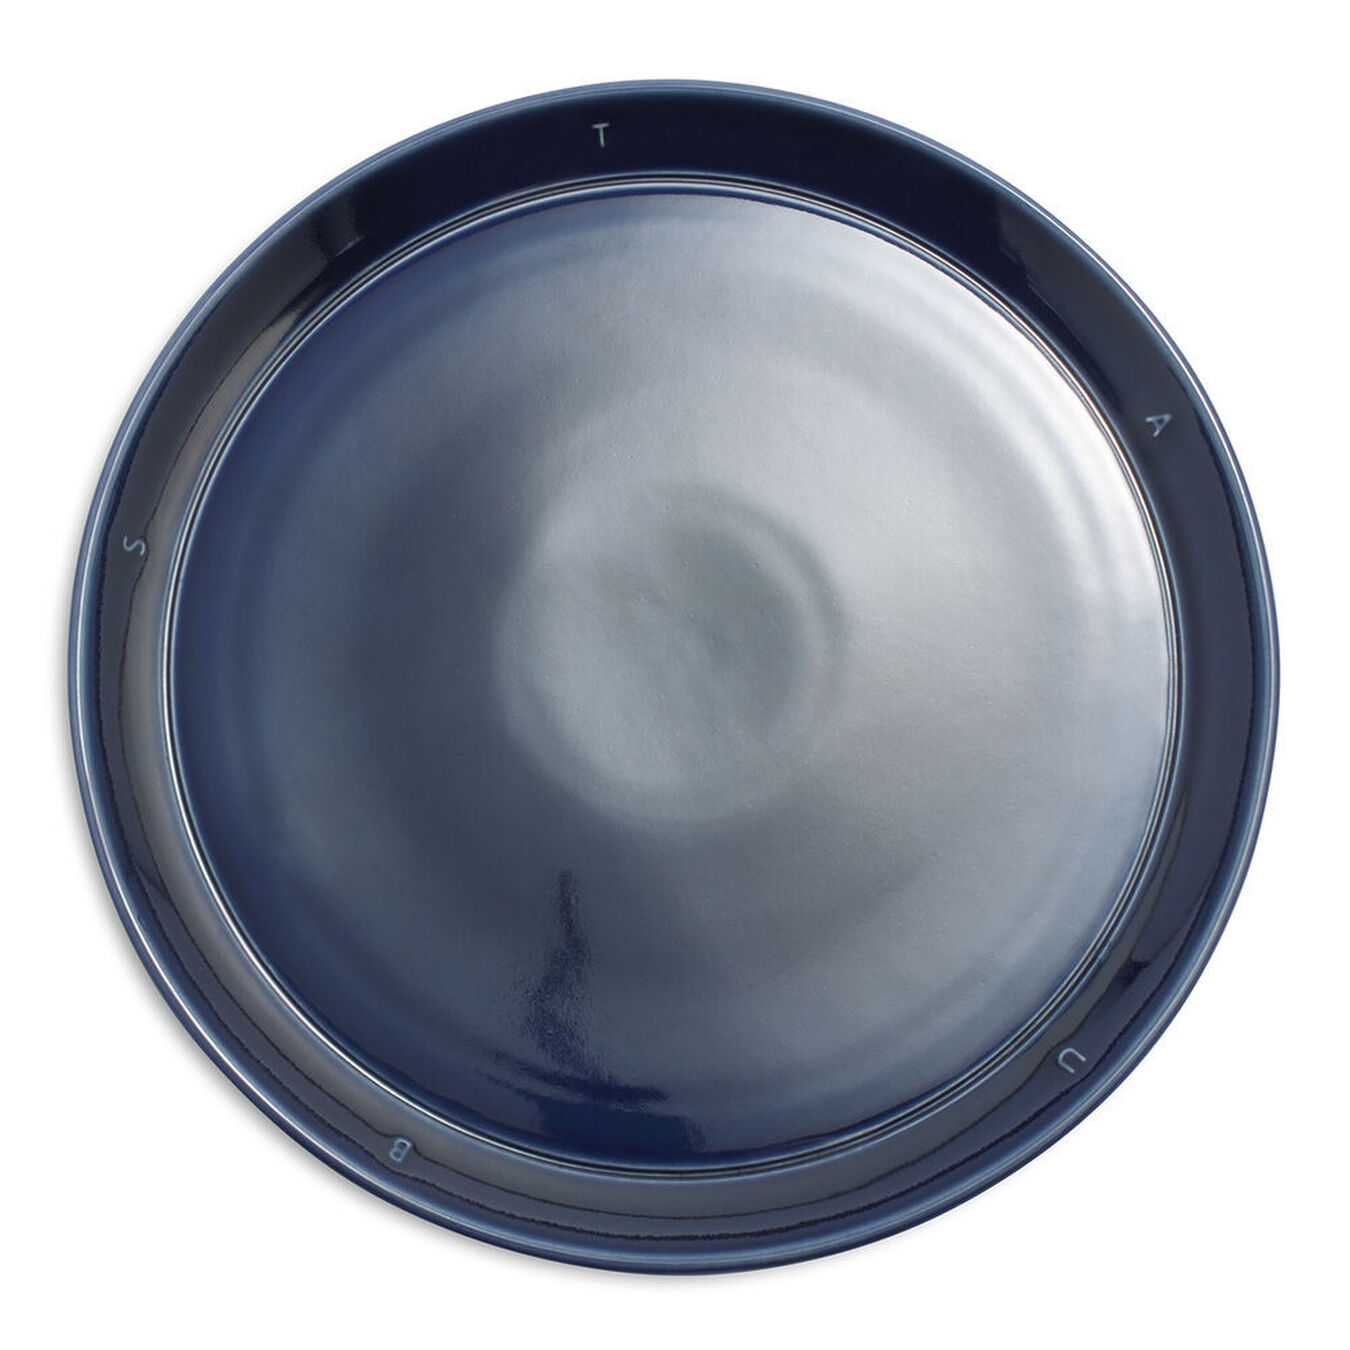 "11.25 inch, Dinner Plate 28.5cm / 11.25"" - Dark Blue, dark blue,,large 1"